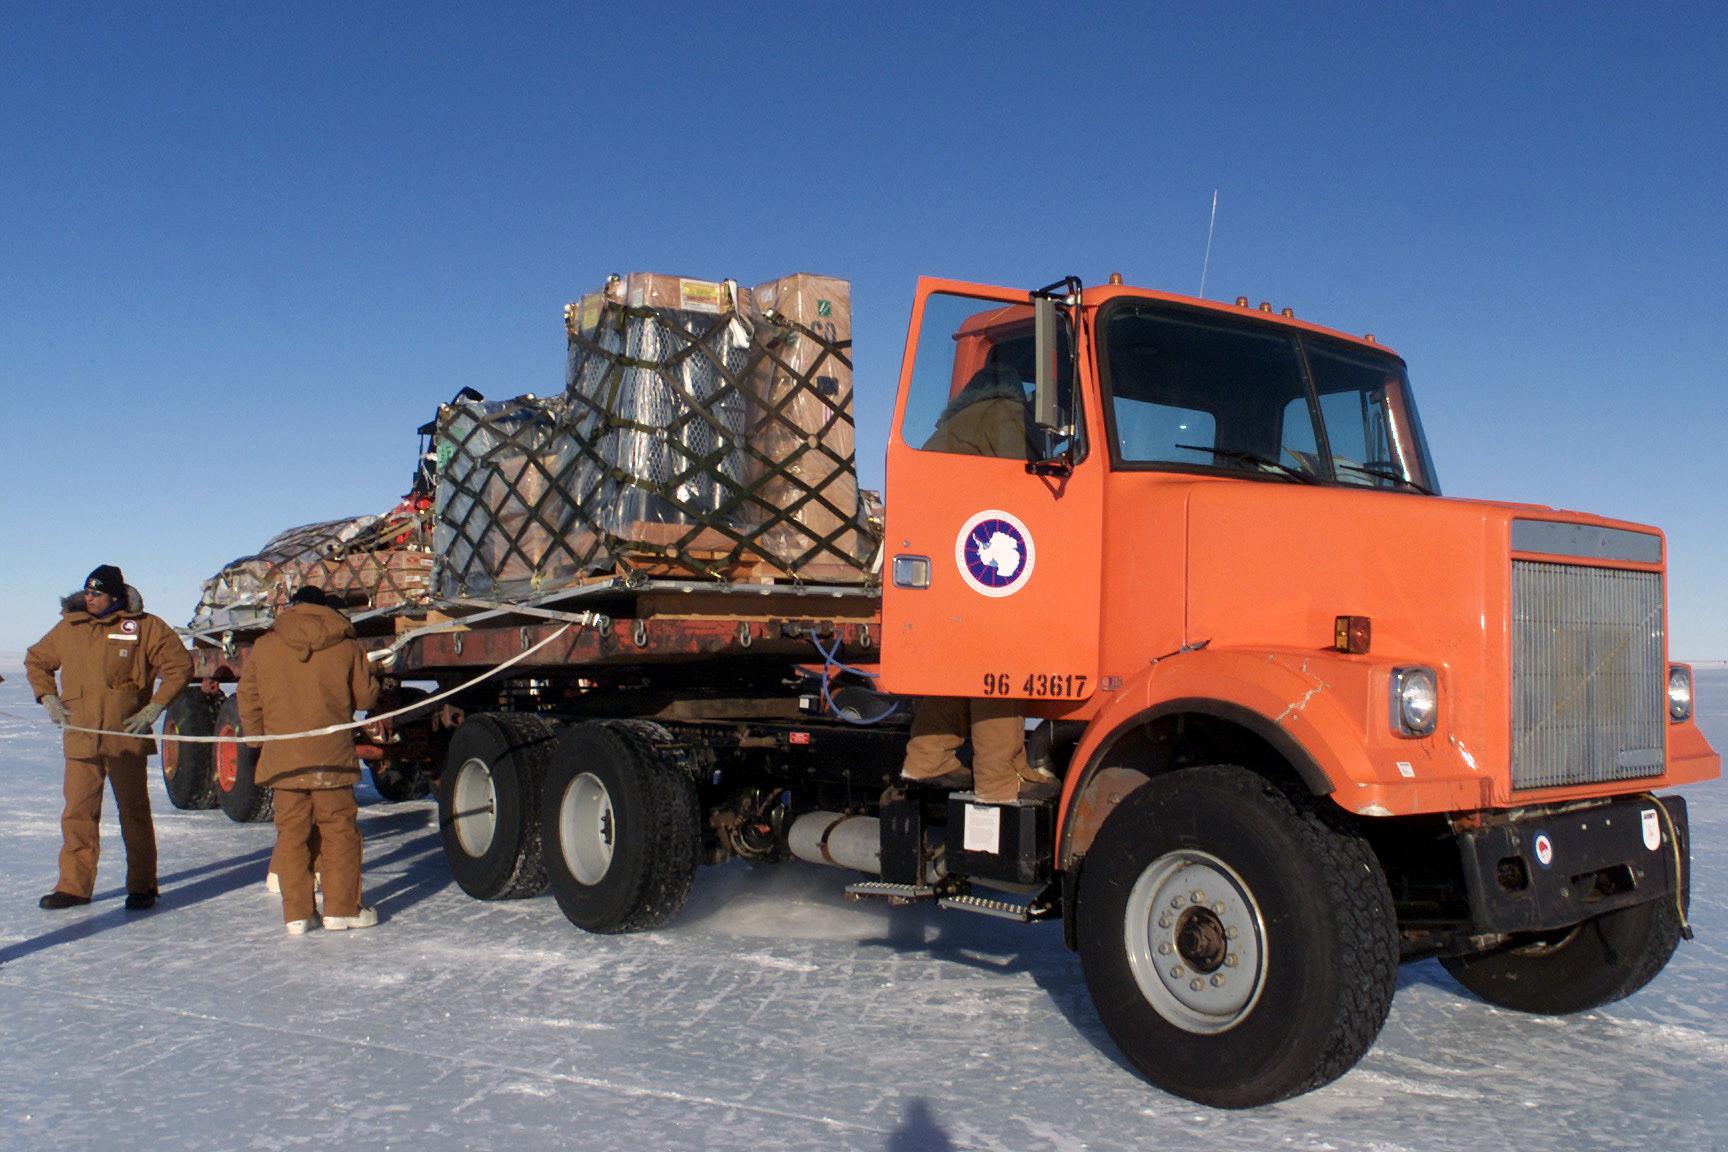 File:Cargo truck in Antarctica.JPEG - Wikimedia Commons